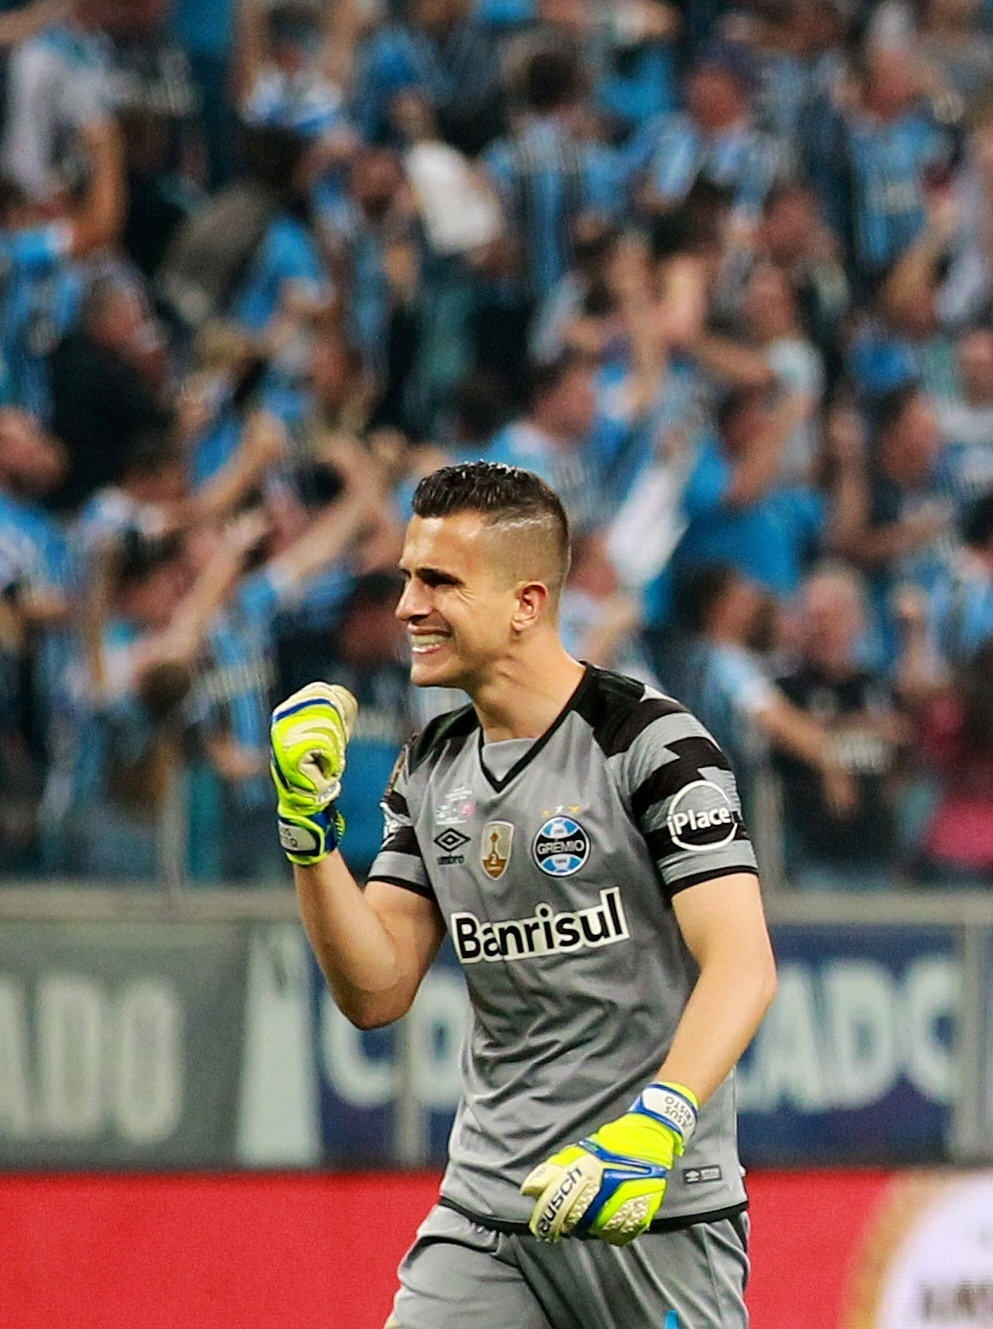 b792e14a11 Grêmio aceita proposta e acerta venda de Marcelo Grohe para o Al-Ittihad -  27 12 2018 - UOL Esporte